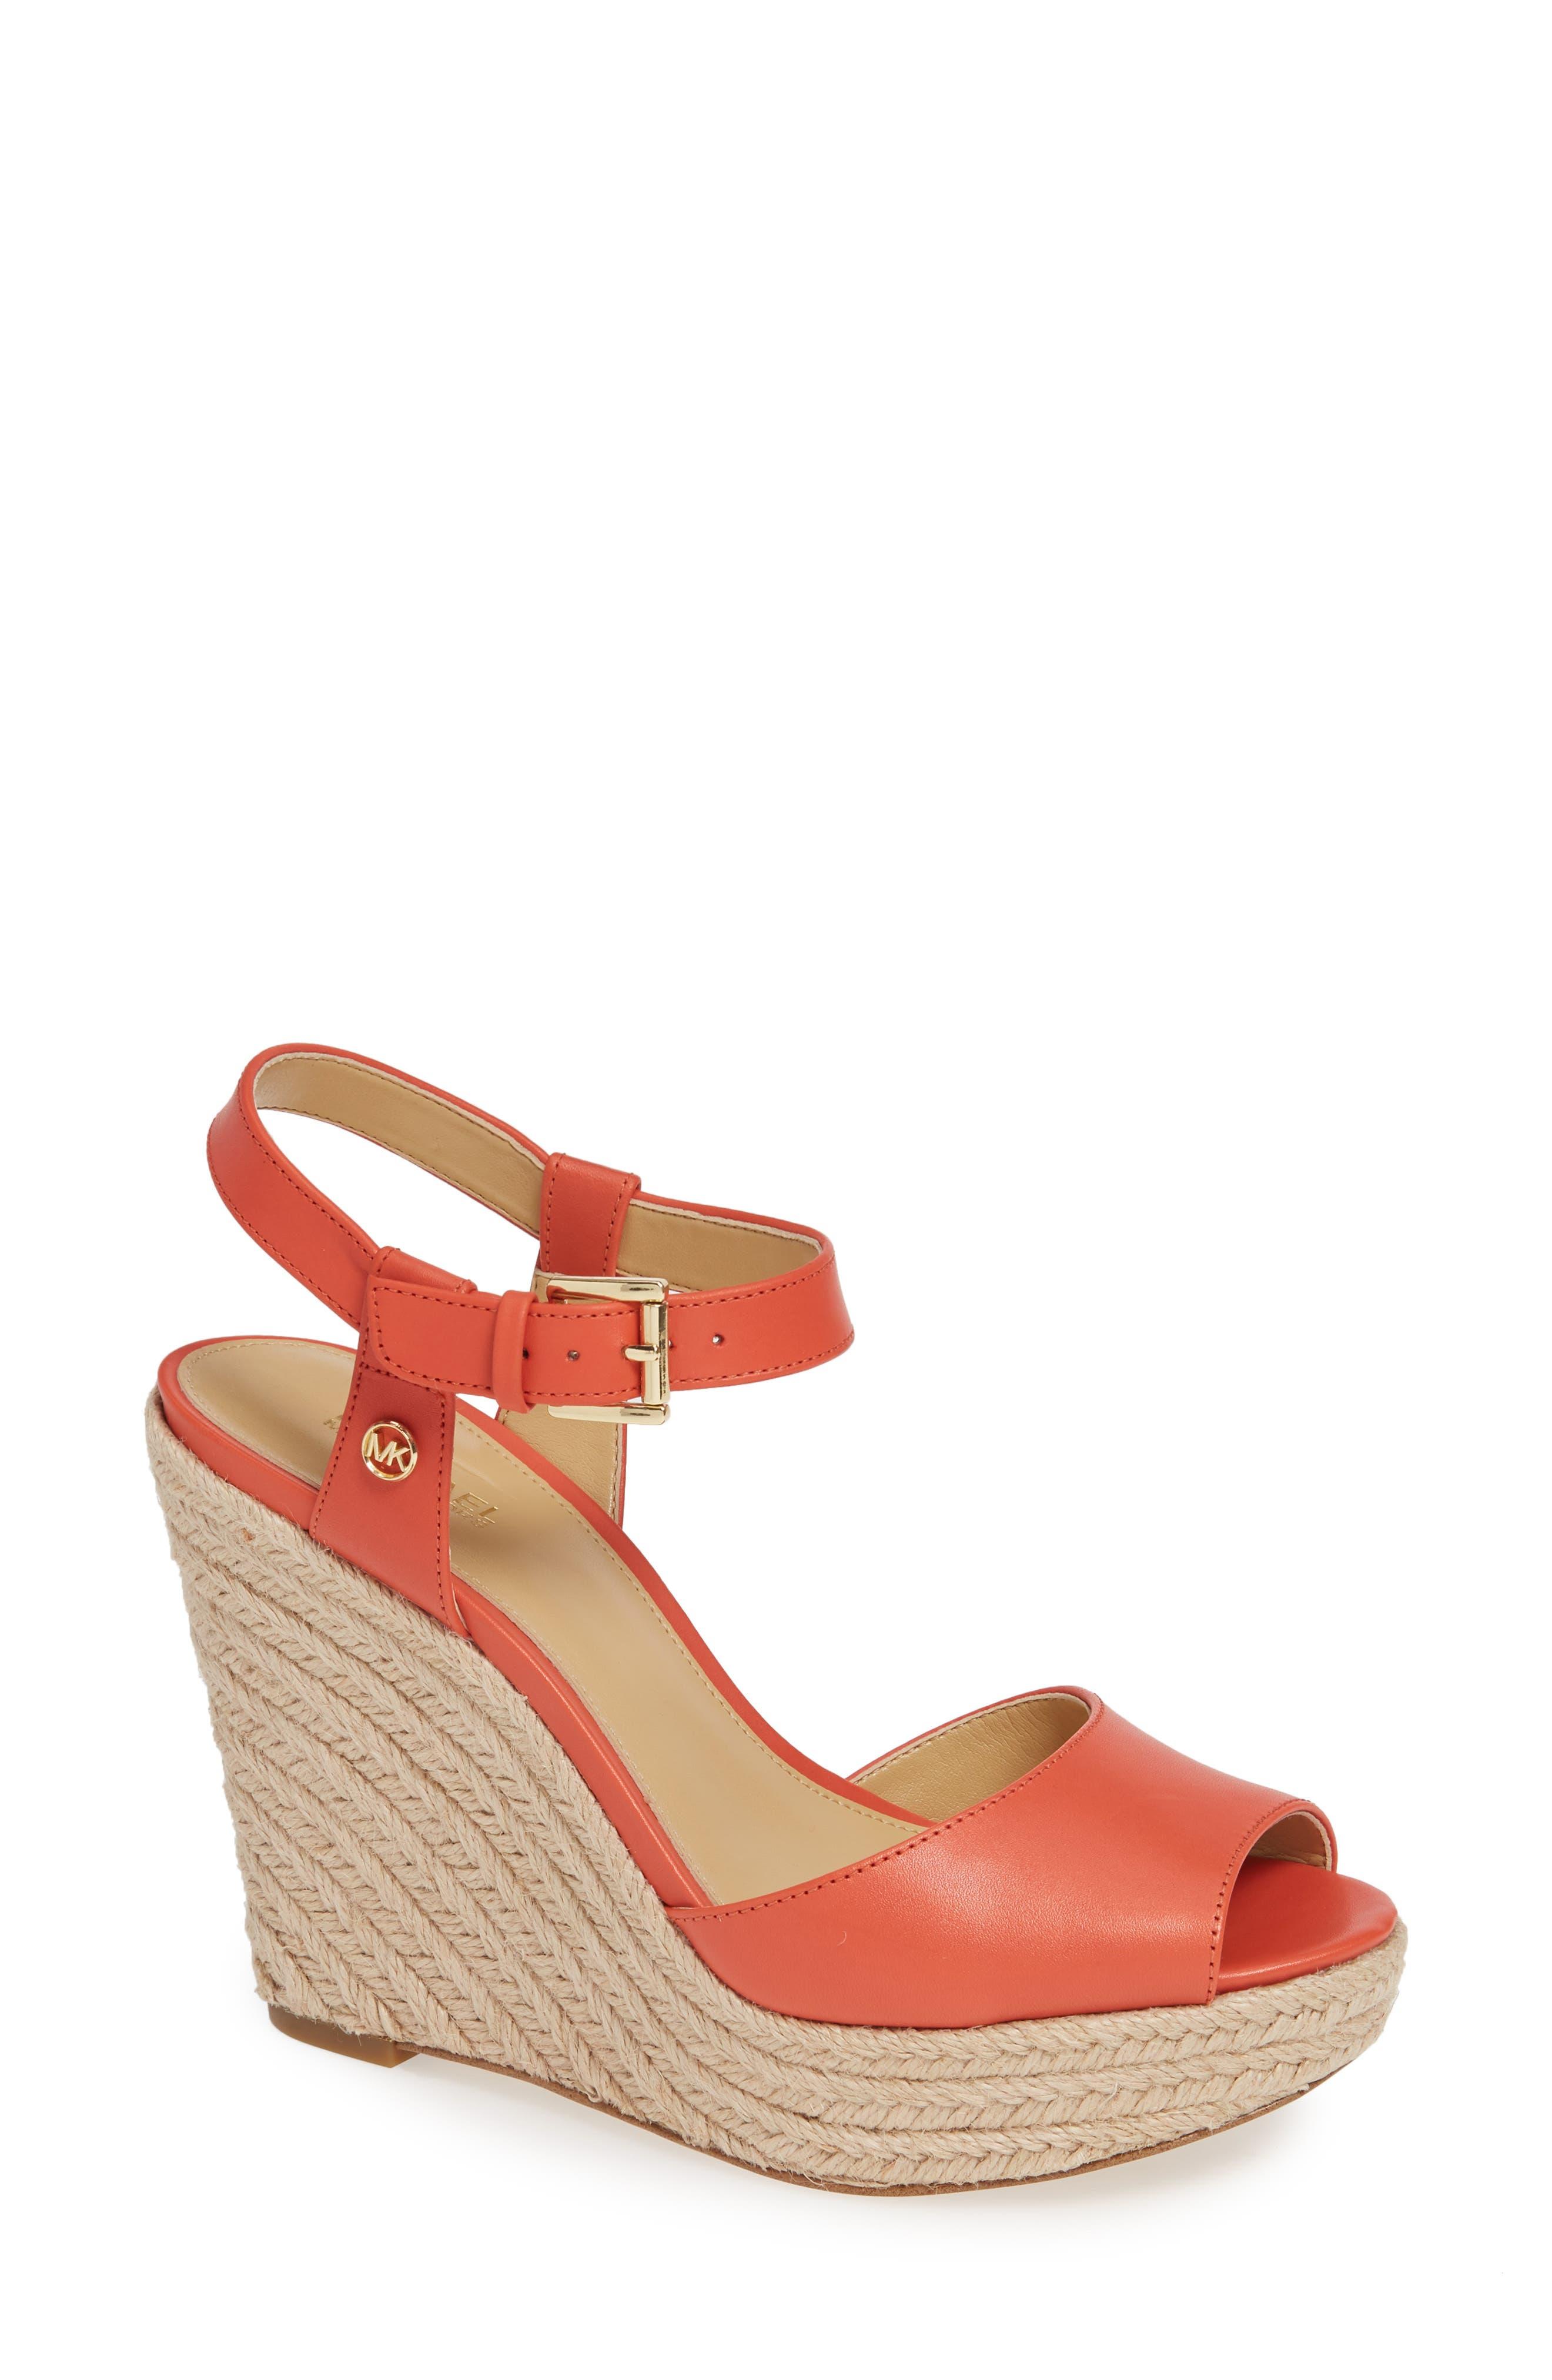 Michael Michael Kors Carlyn Espadrille Wedge Sandal- Red